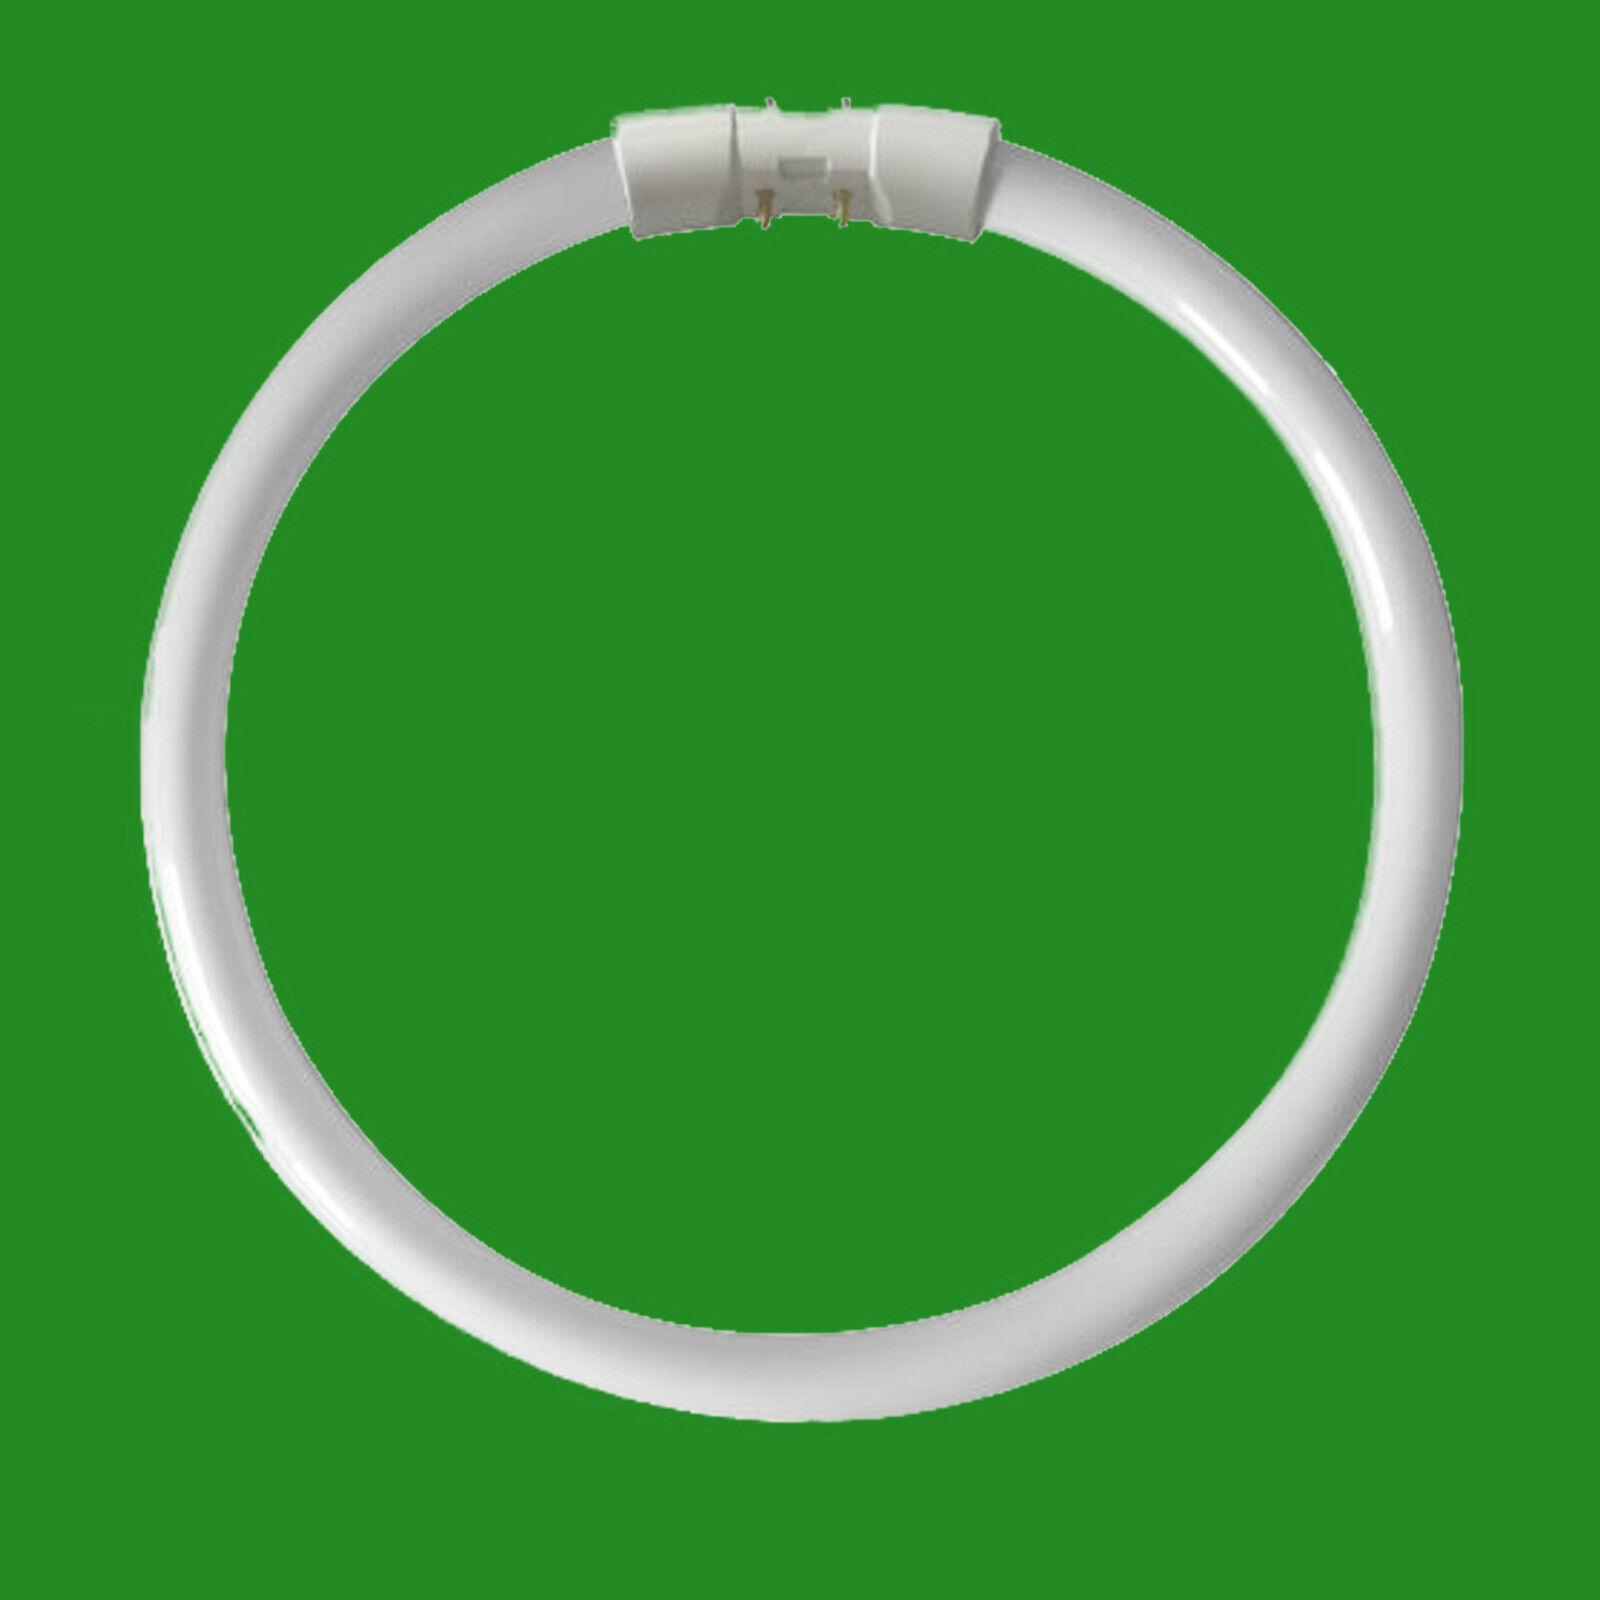 8x 55W 2GX13 4 Pin T5C Circular 302mm Lamp Fluorescent Tube 4000K Light Bulb